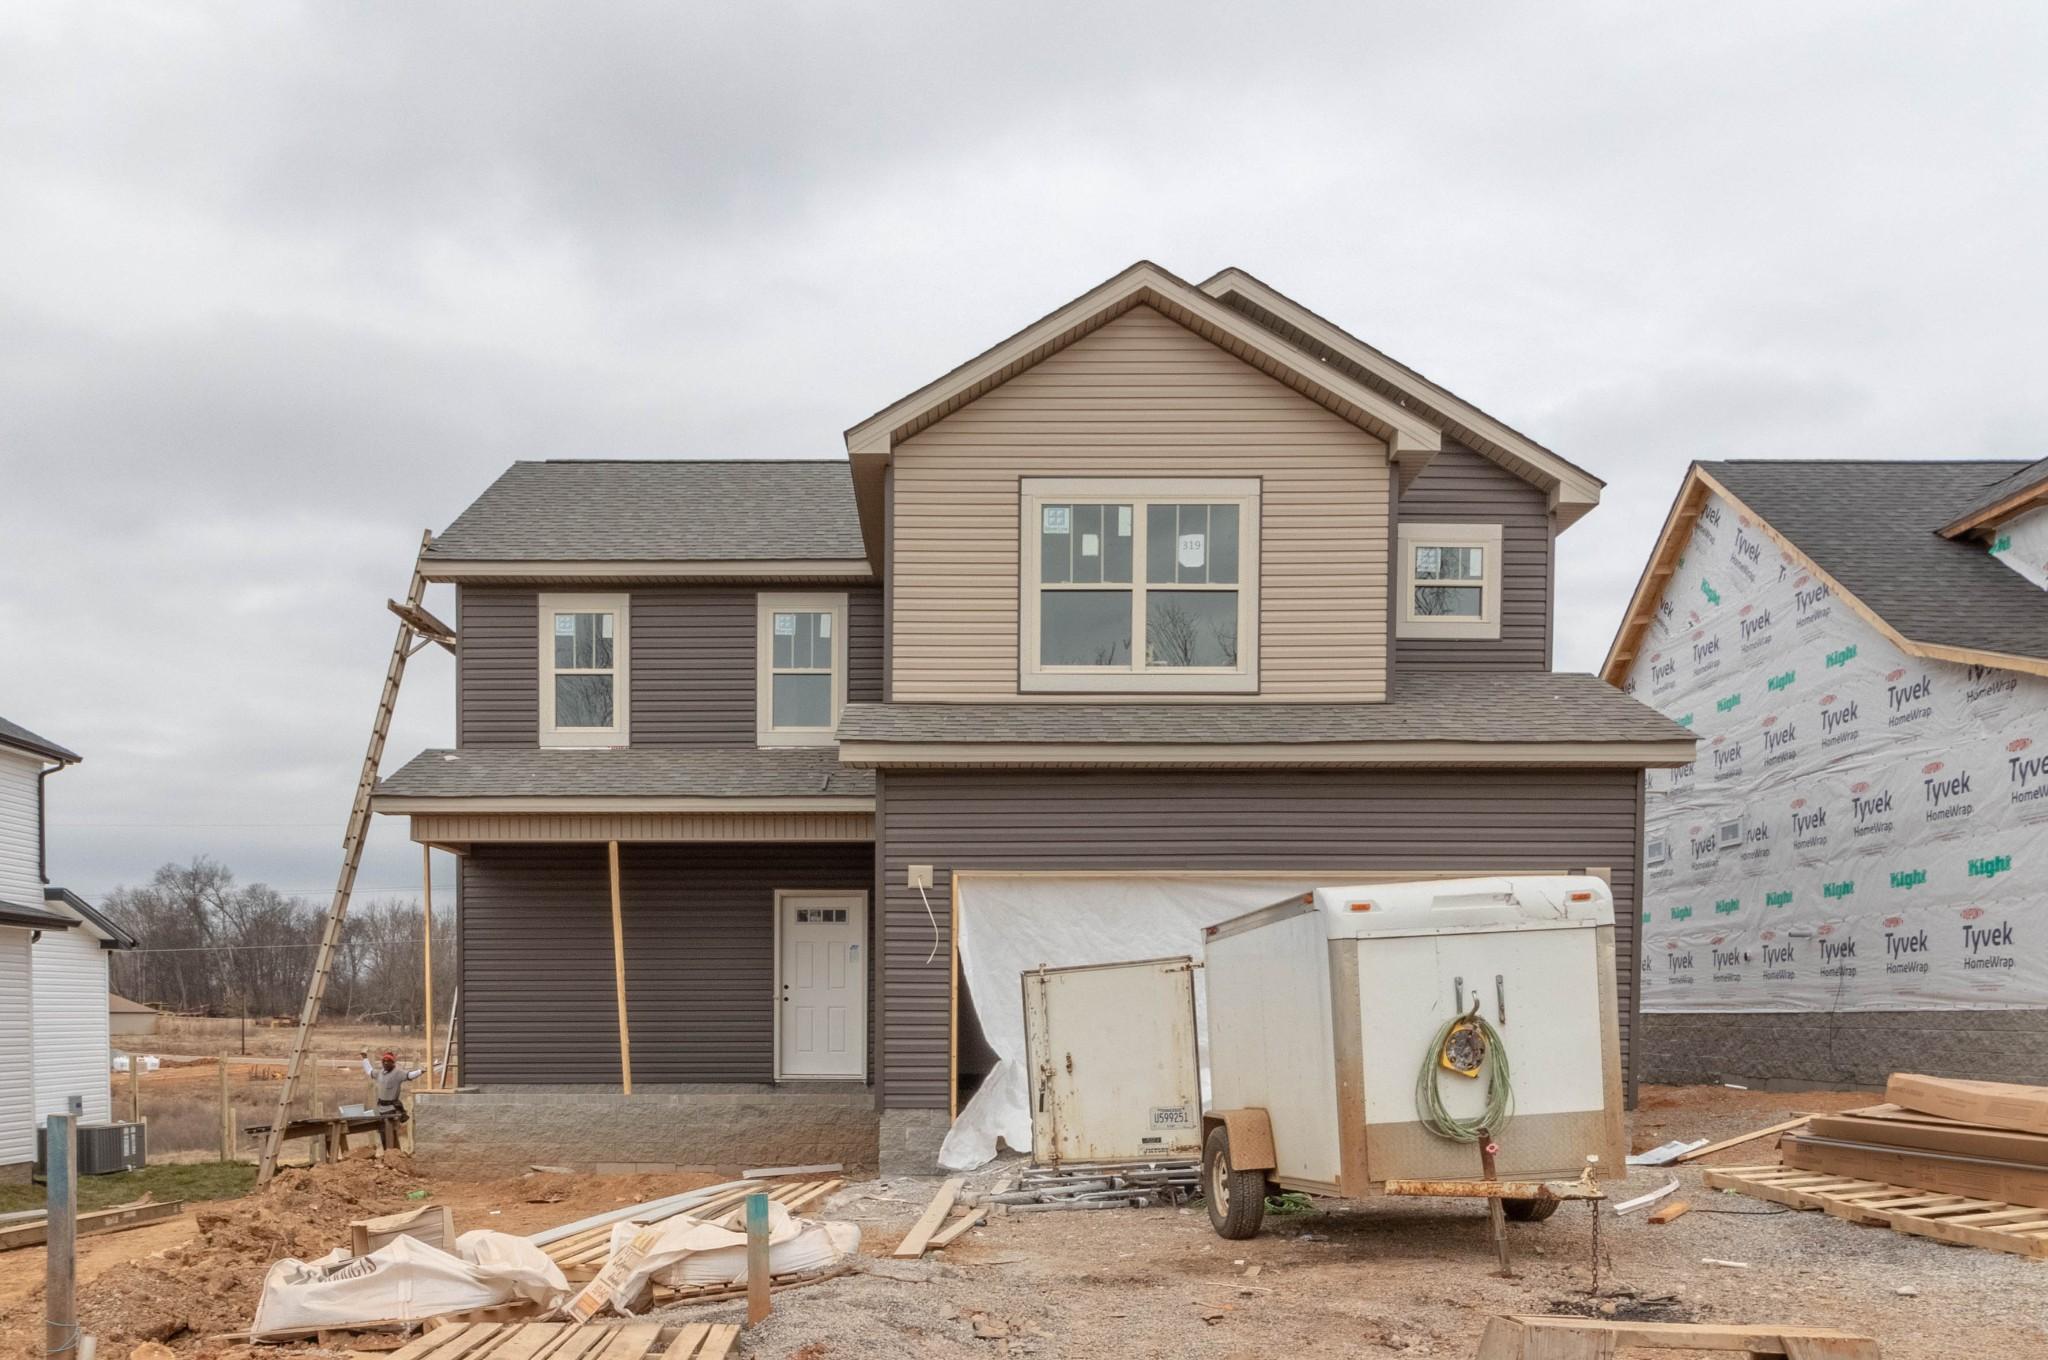 319 Eagles Bluff, Clarksville, TN 37040 - Clarksville, TN real estate listing